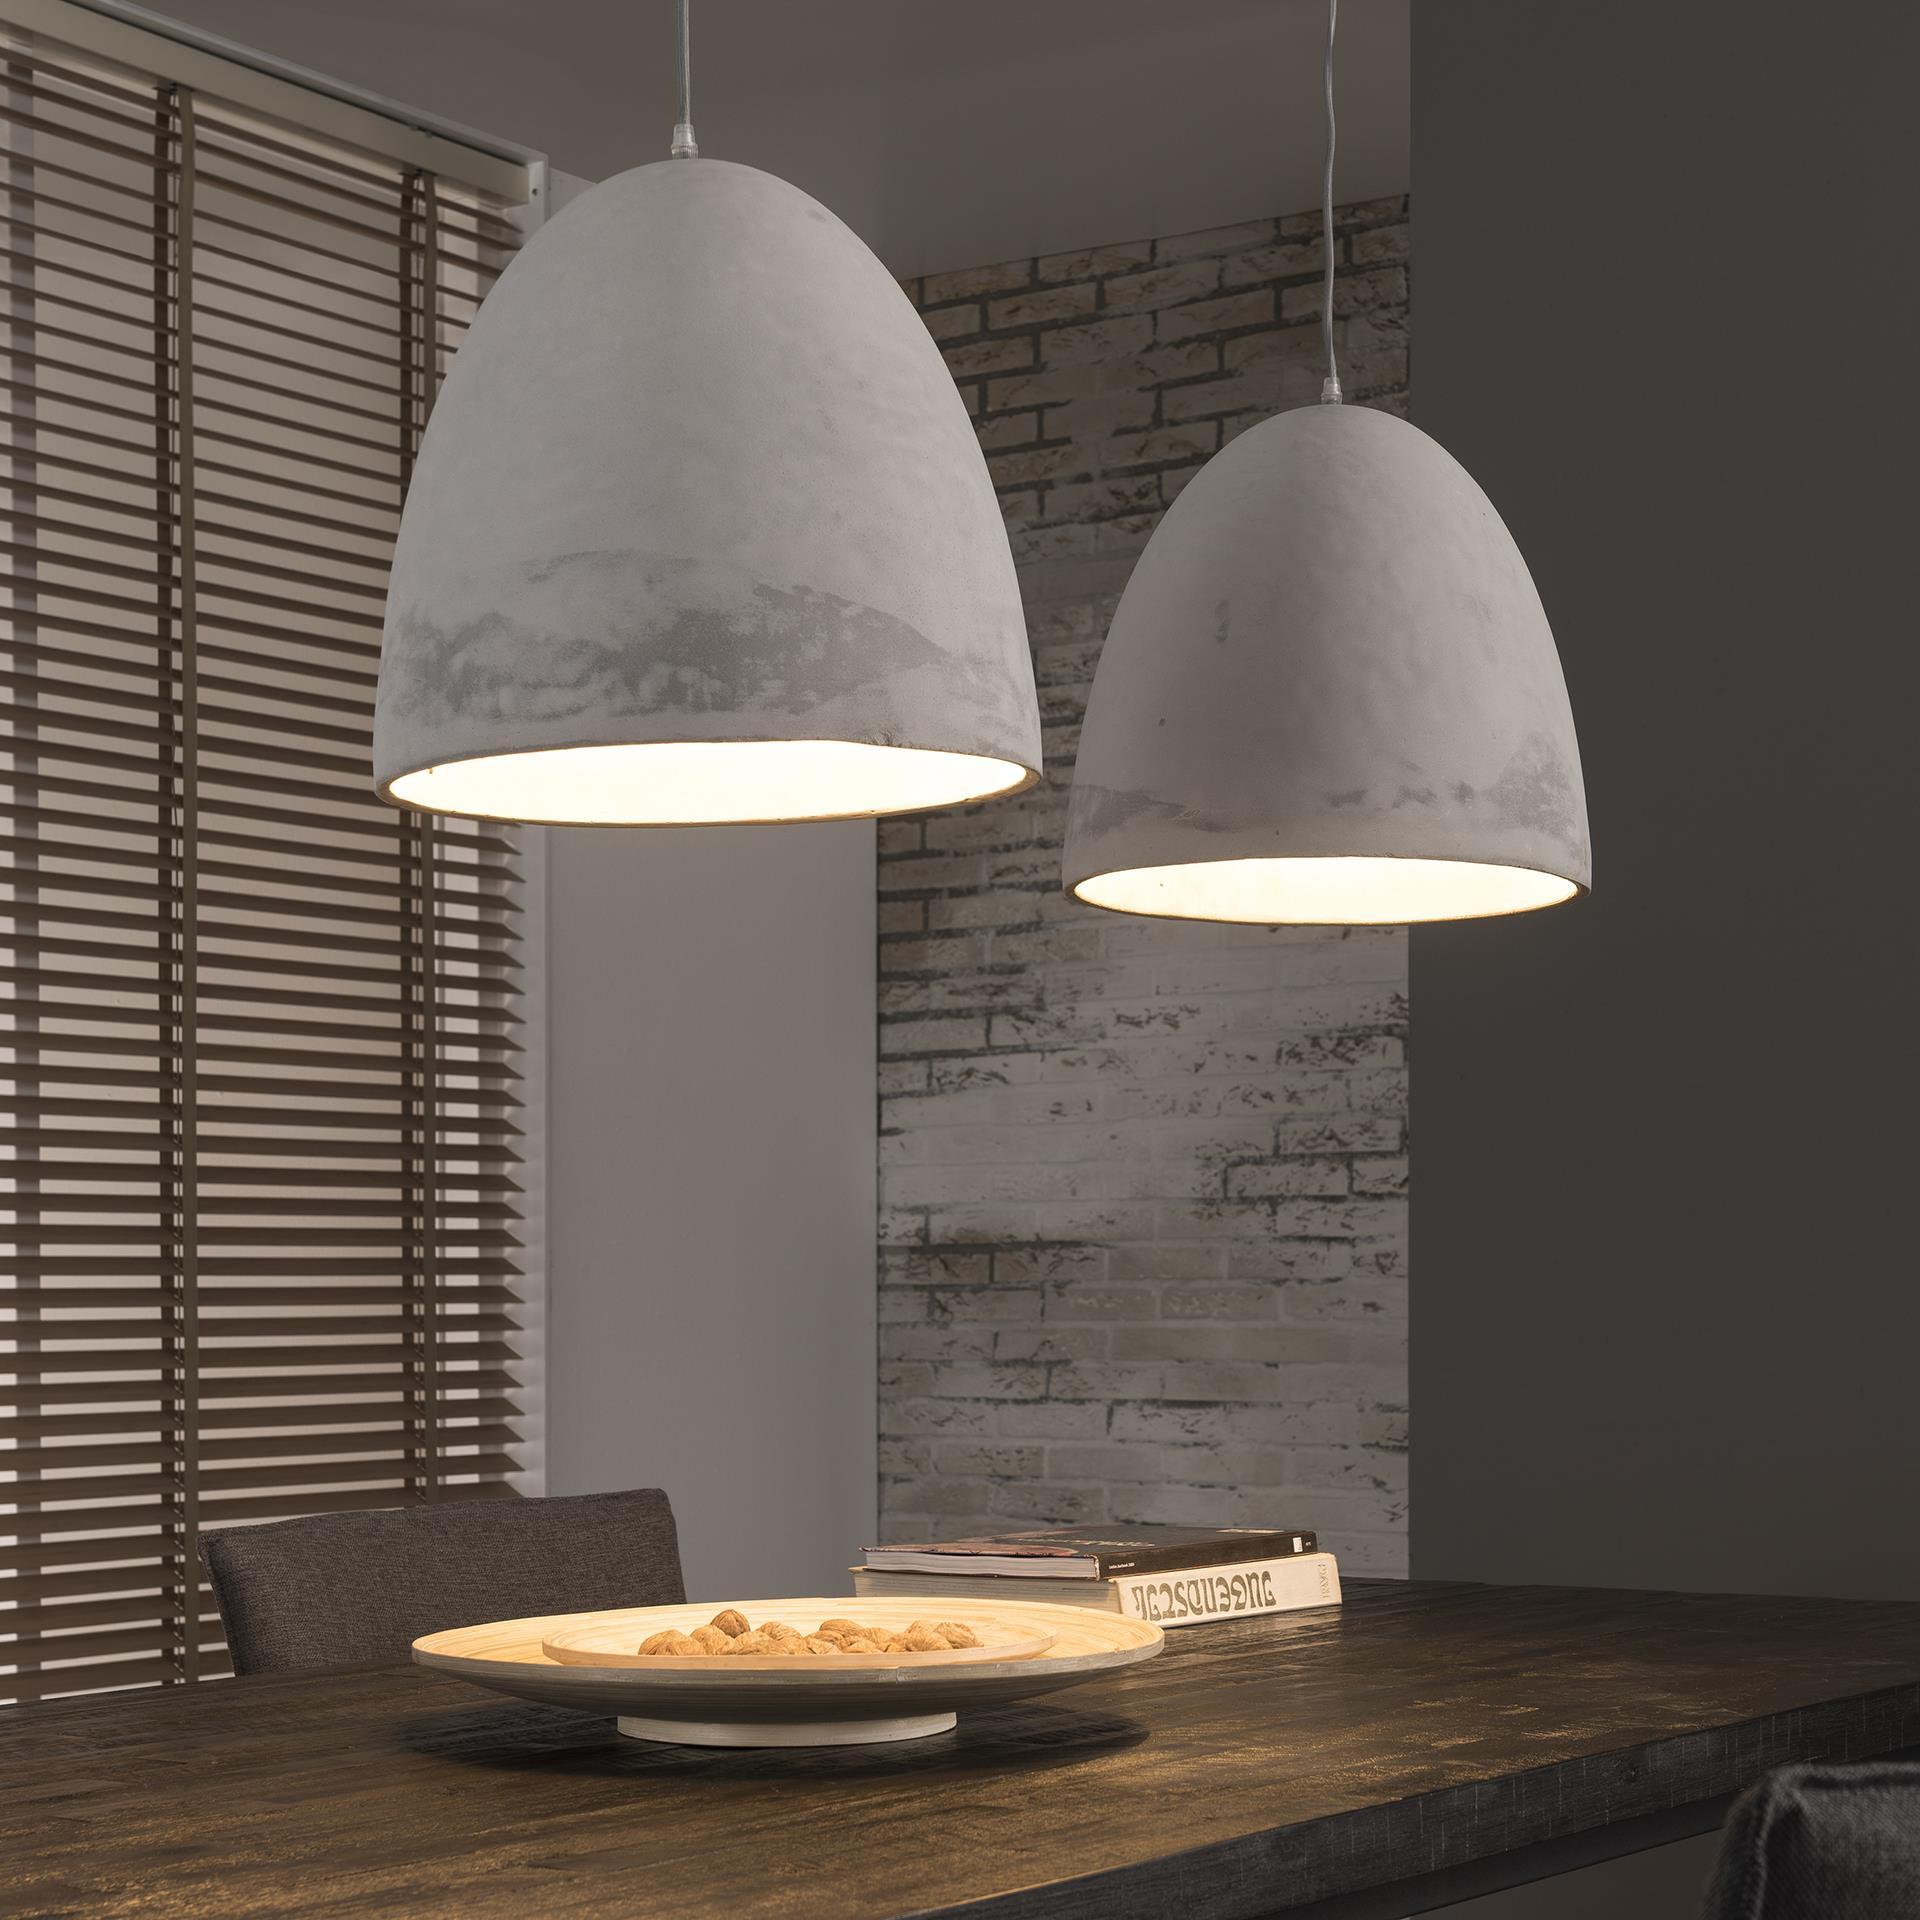 Dubbele Hanglamp 'Ace' beton Verlichting